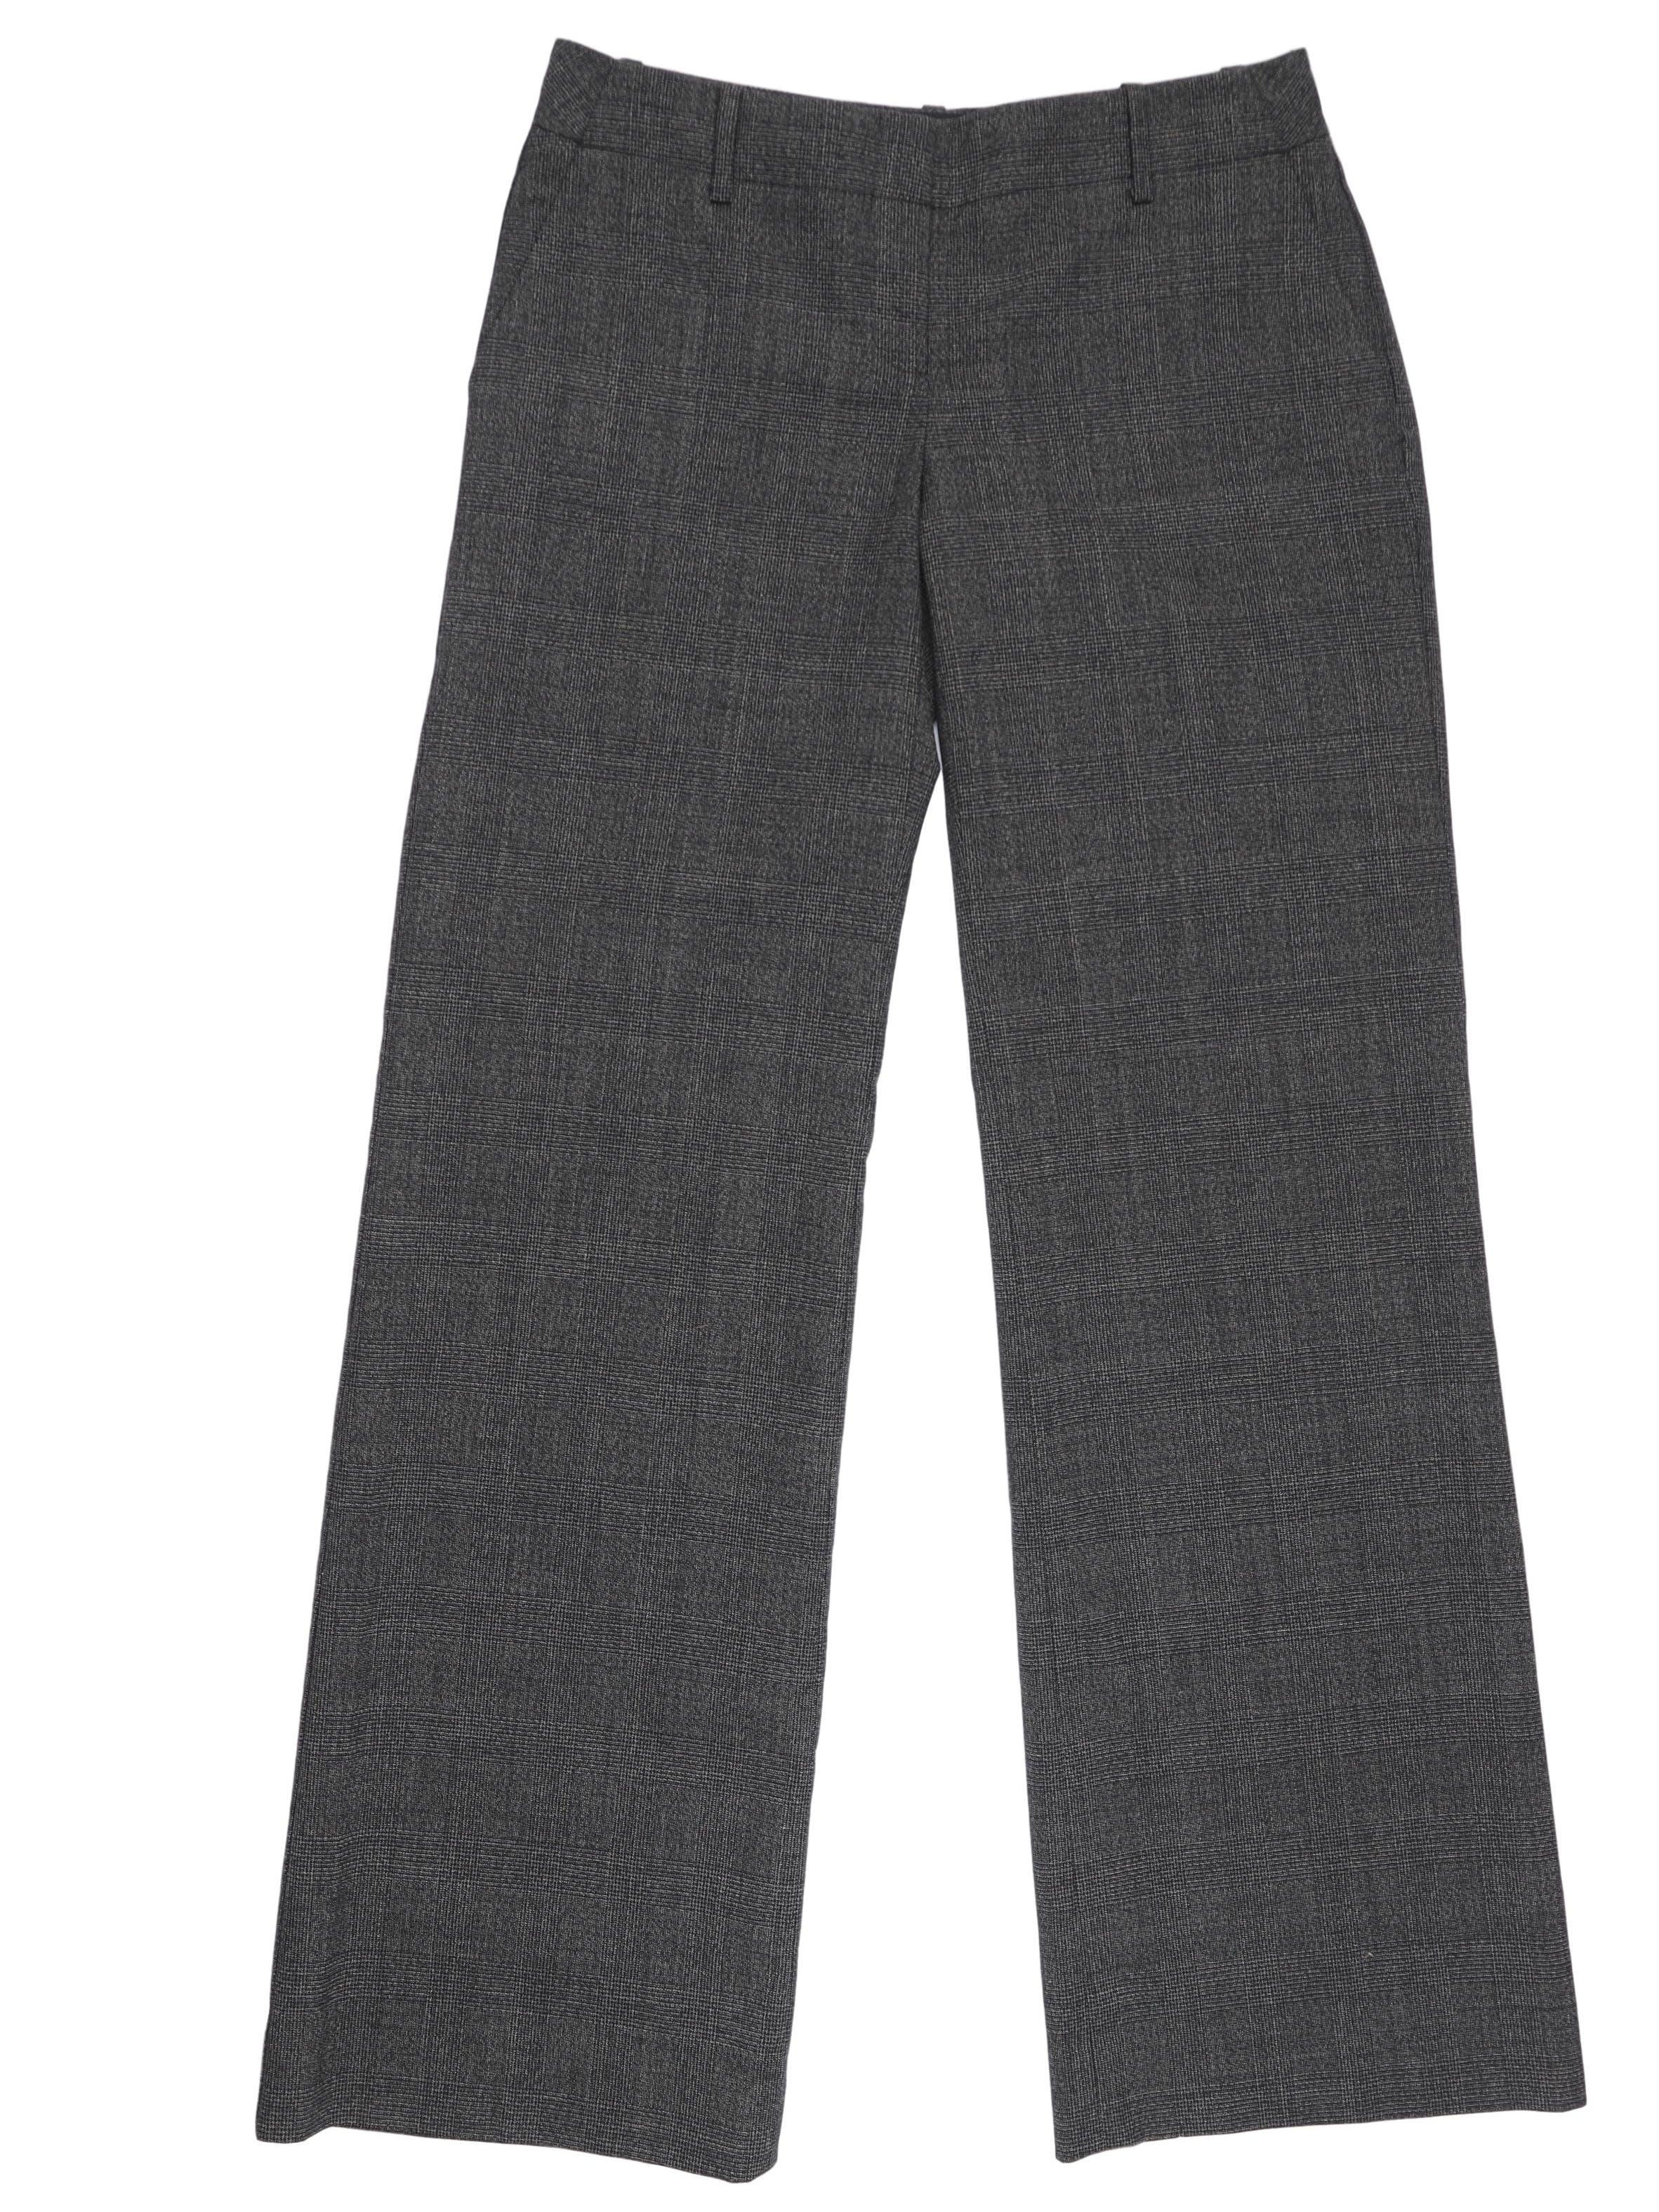 Pantalón The Limited a cuadros grises, bolsillos laterales y posteriores, corte semi palazzo, lleva forro. Pretina 78 cm. Precio original S/ 280